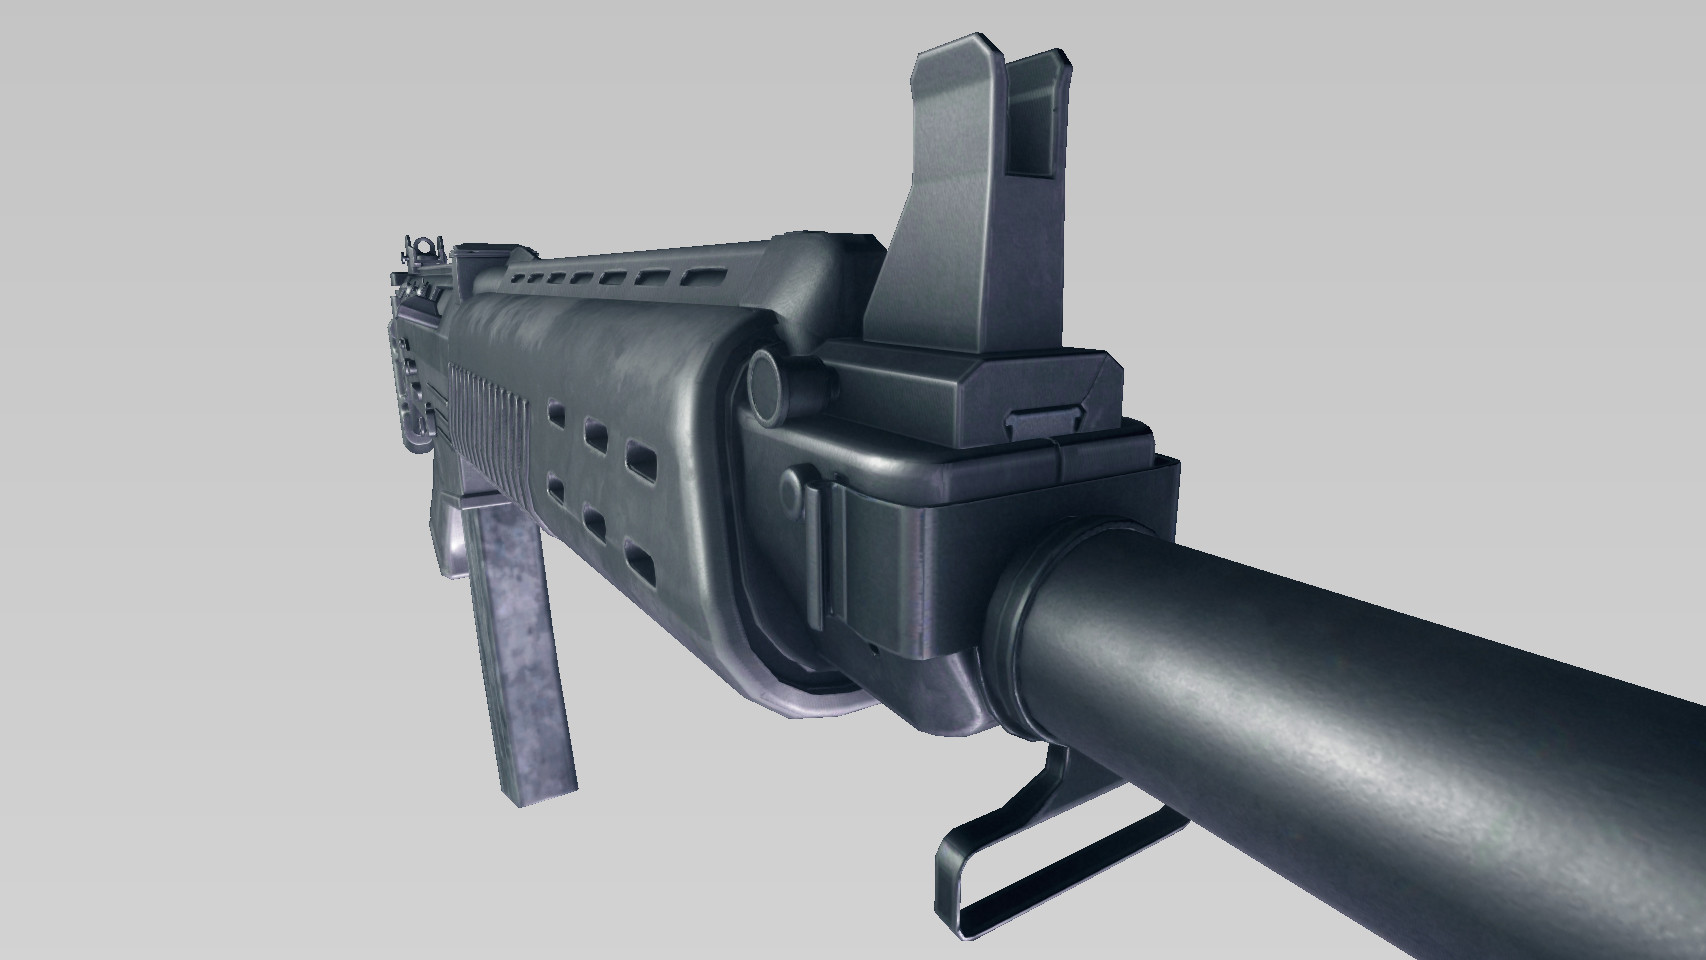 Daniel ketterman assault rifle2